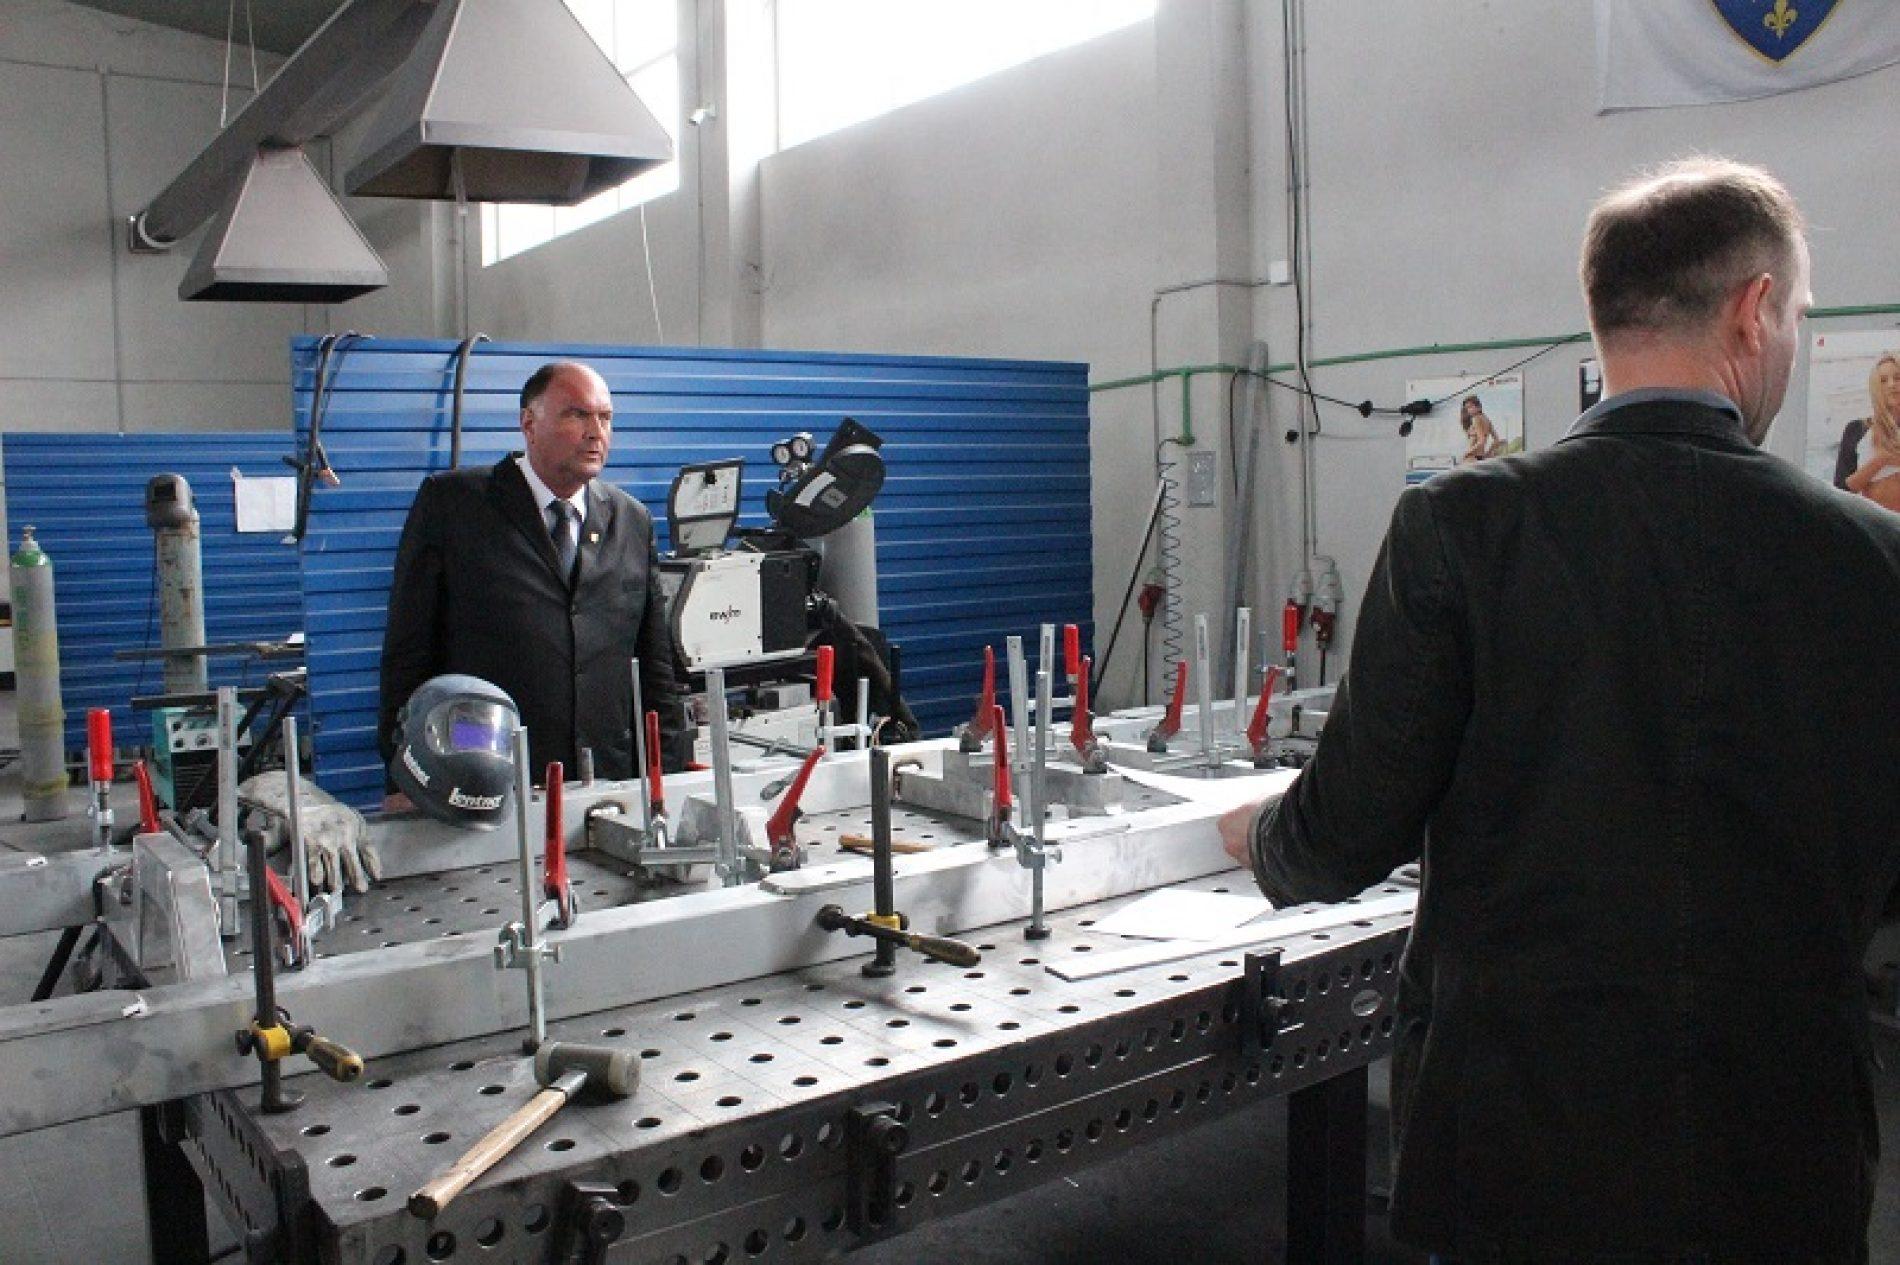 Živinice: Uskoro proizvodnja modernih vatrogasnih vozila s oznakom 'Made in Bosnia and Herzegovina'